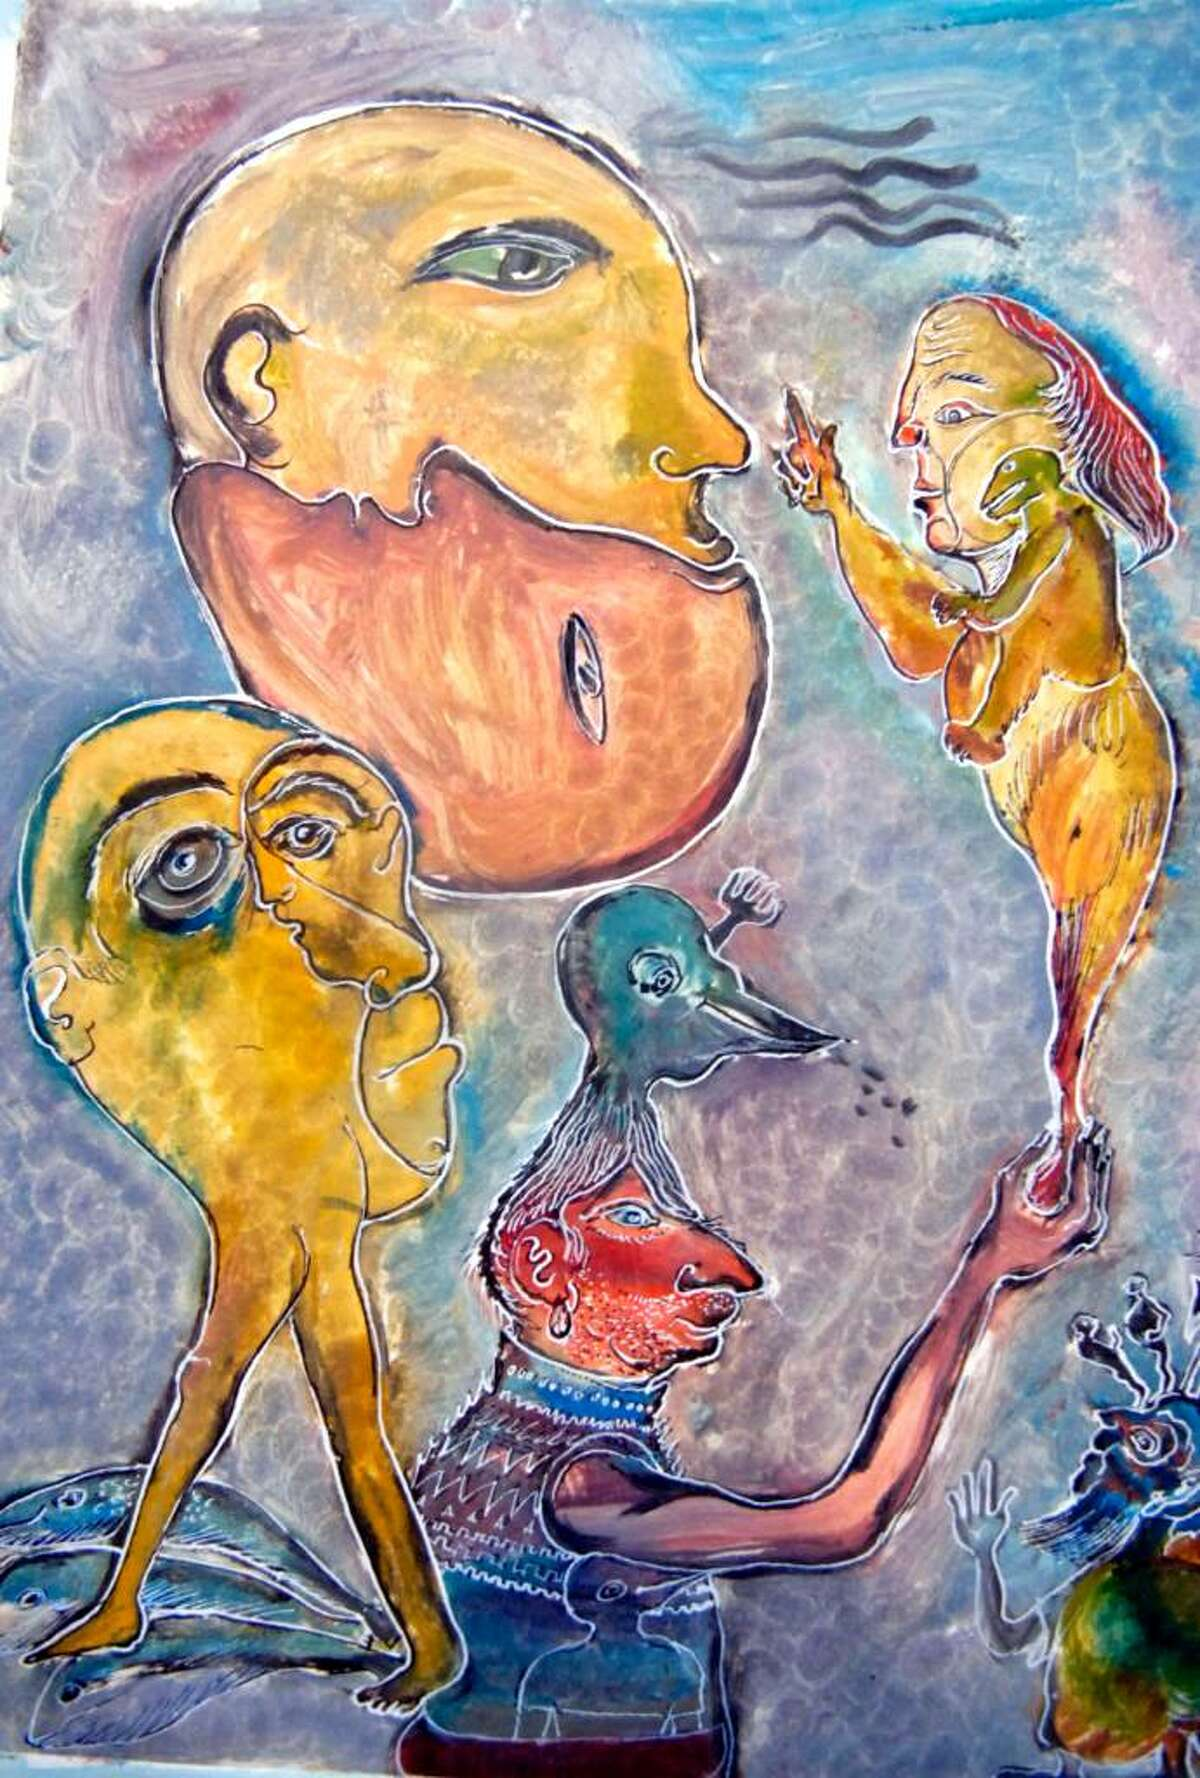 Internationally renowned Dutch artist Kees de Waal's